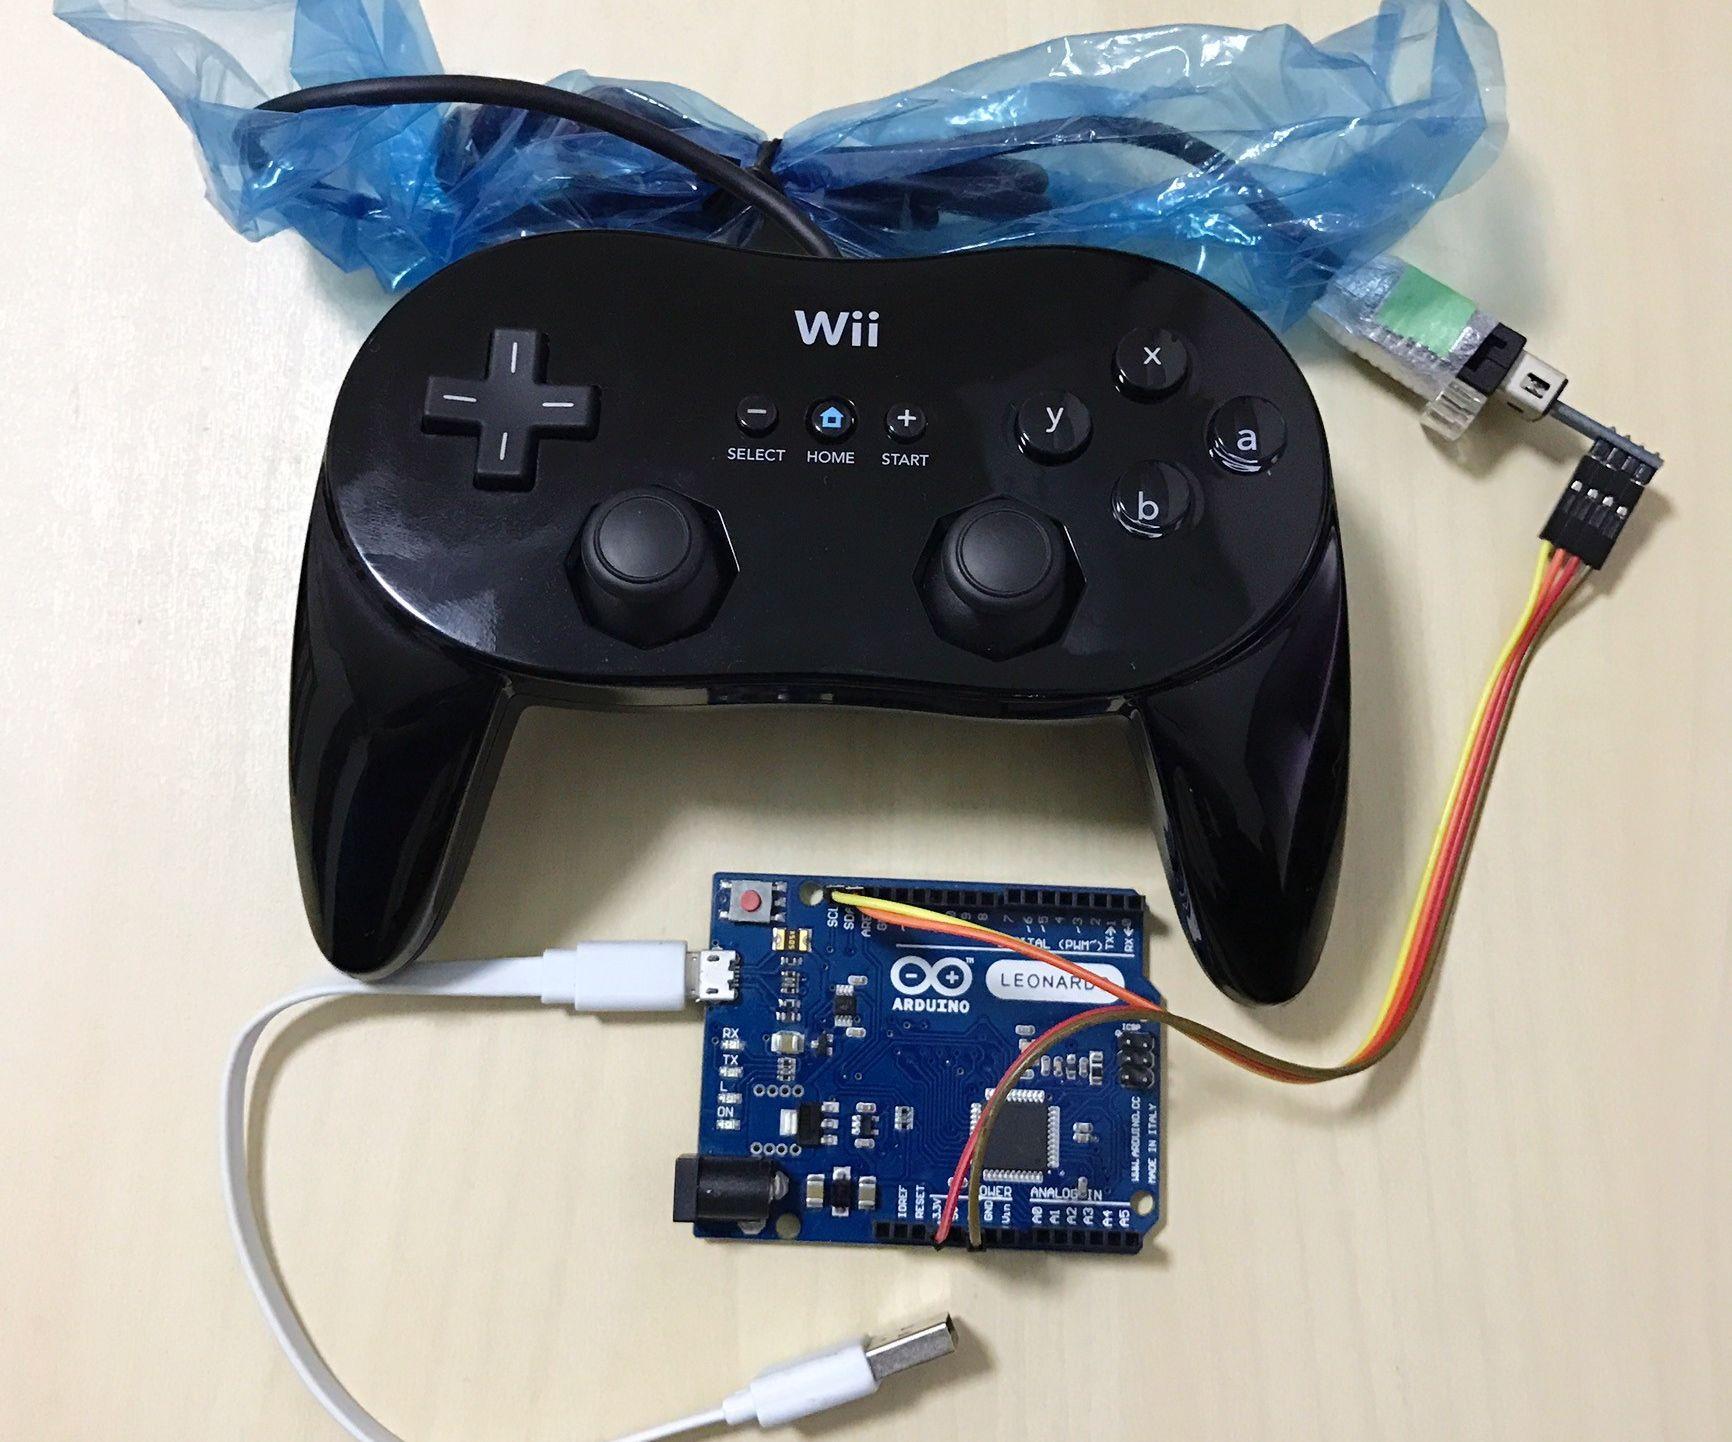 USB Gamepad Using Wii Classic Controller and Arduino Leonardo